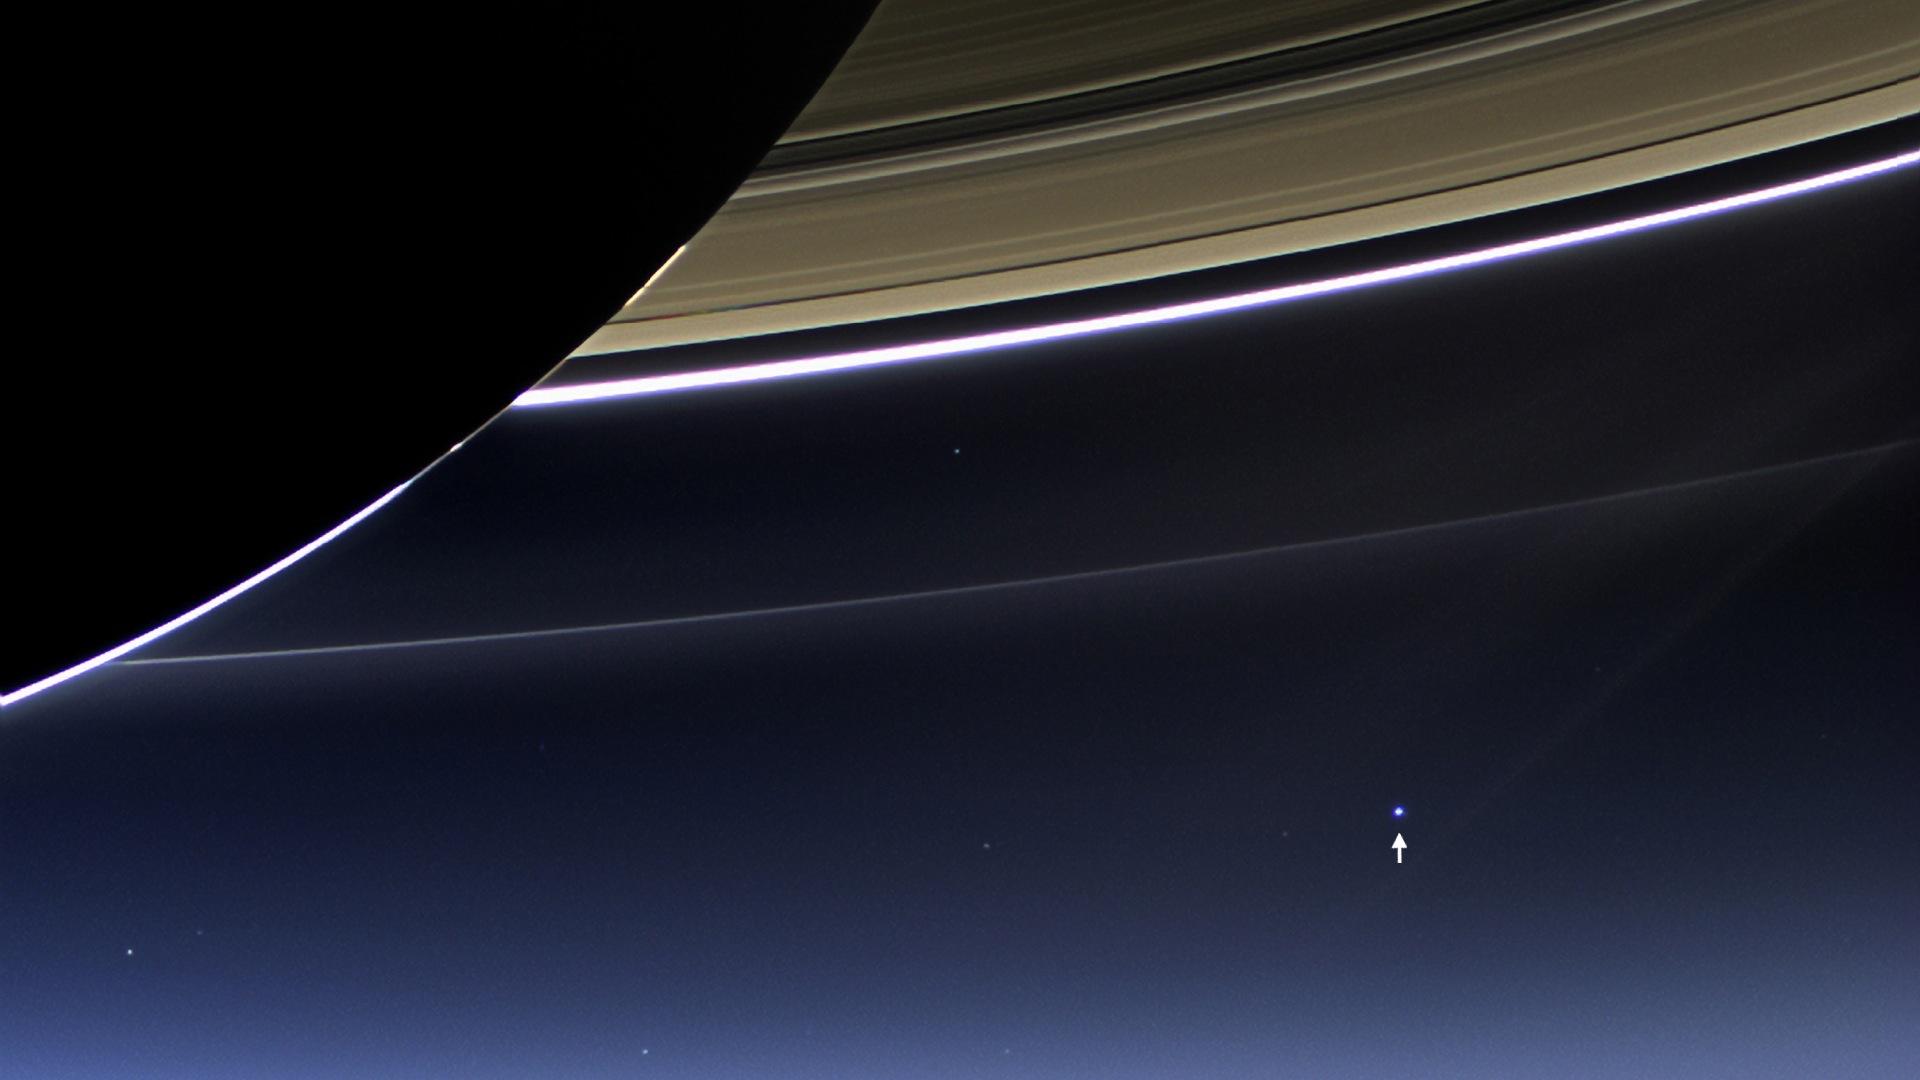 Wallpaper Planet Nasa Sky Earth Saturn Angle Light